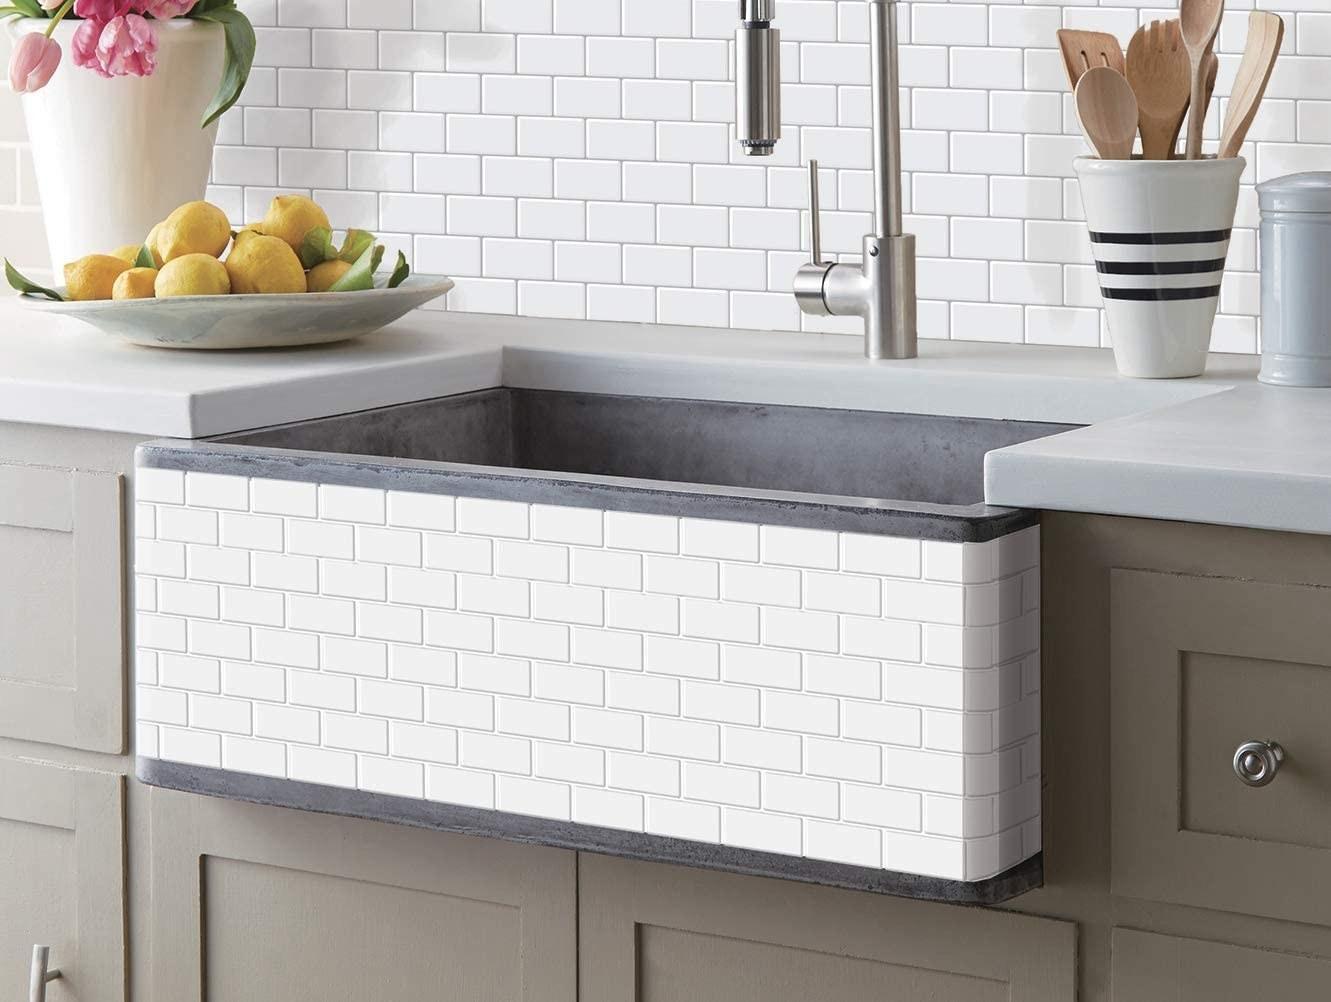 A kitchen back splash covered in the tile sheets